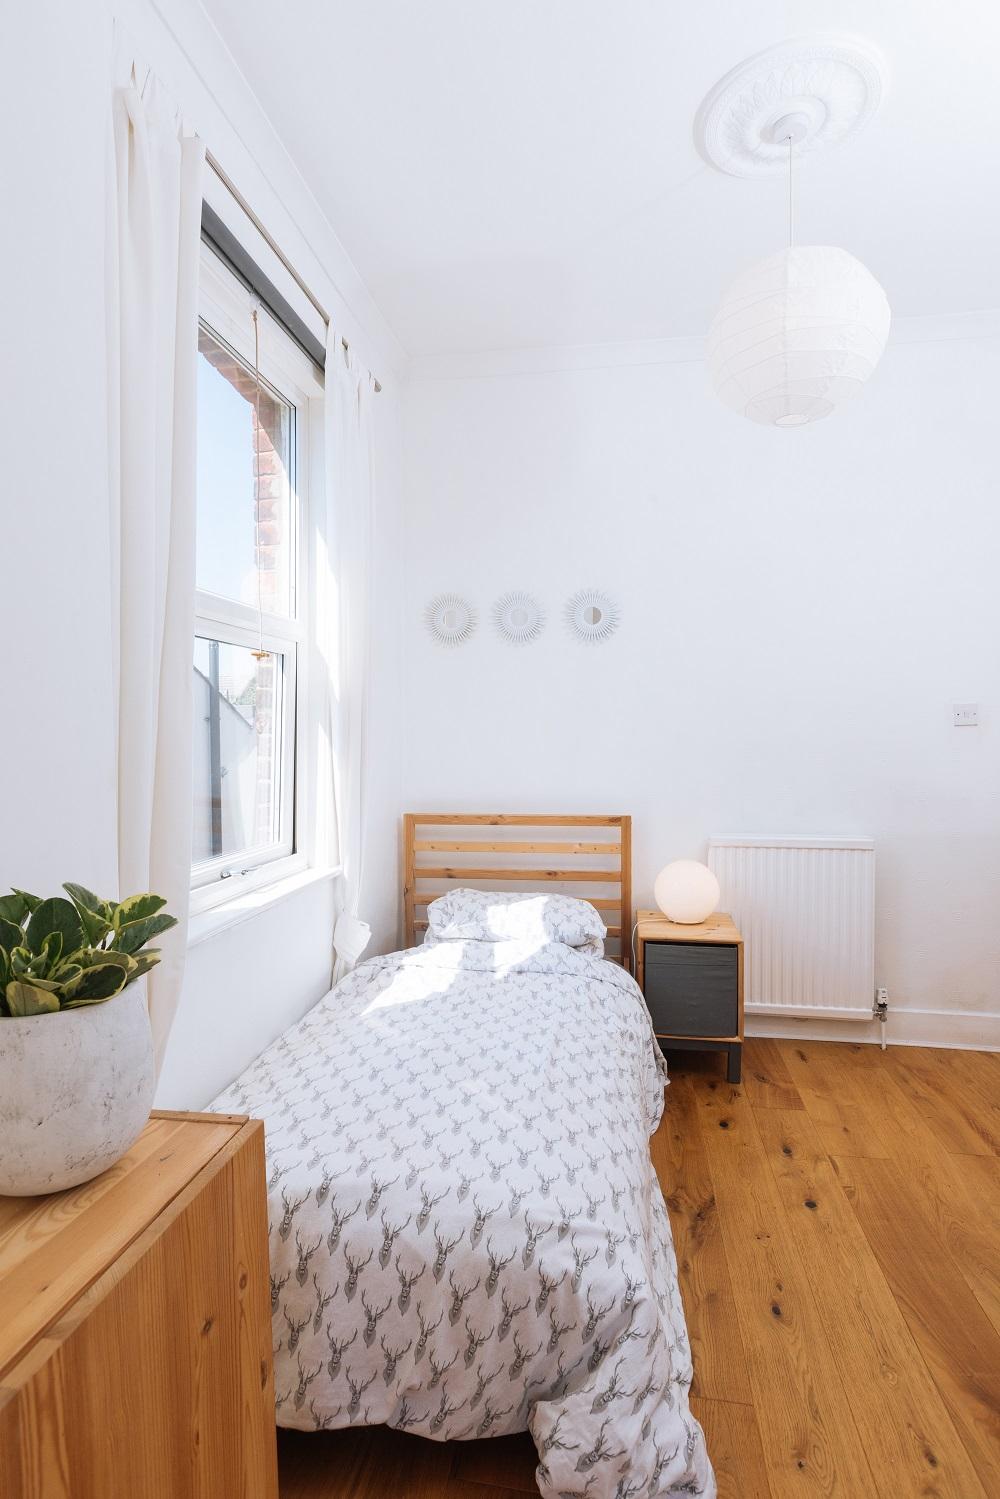 Single bedroom photo by Monica